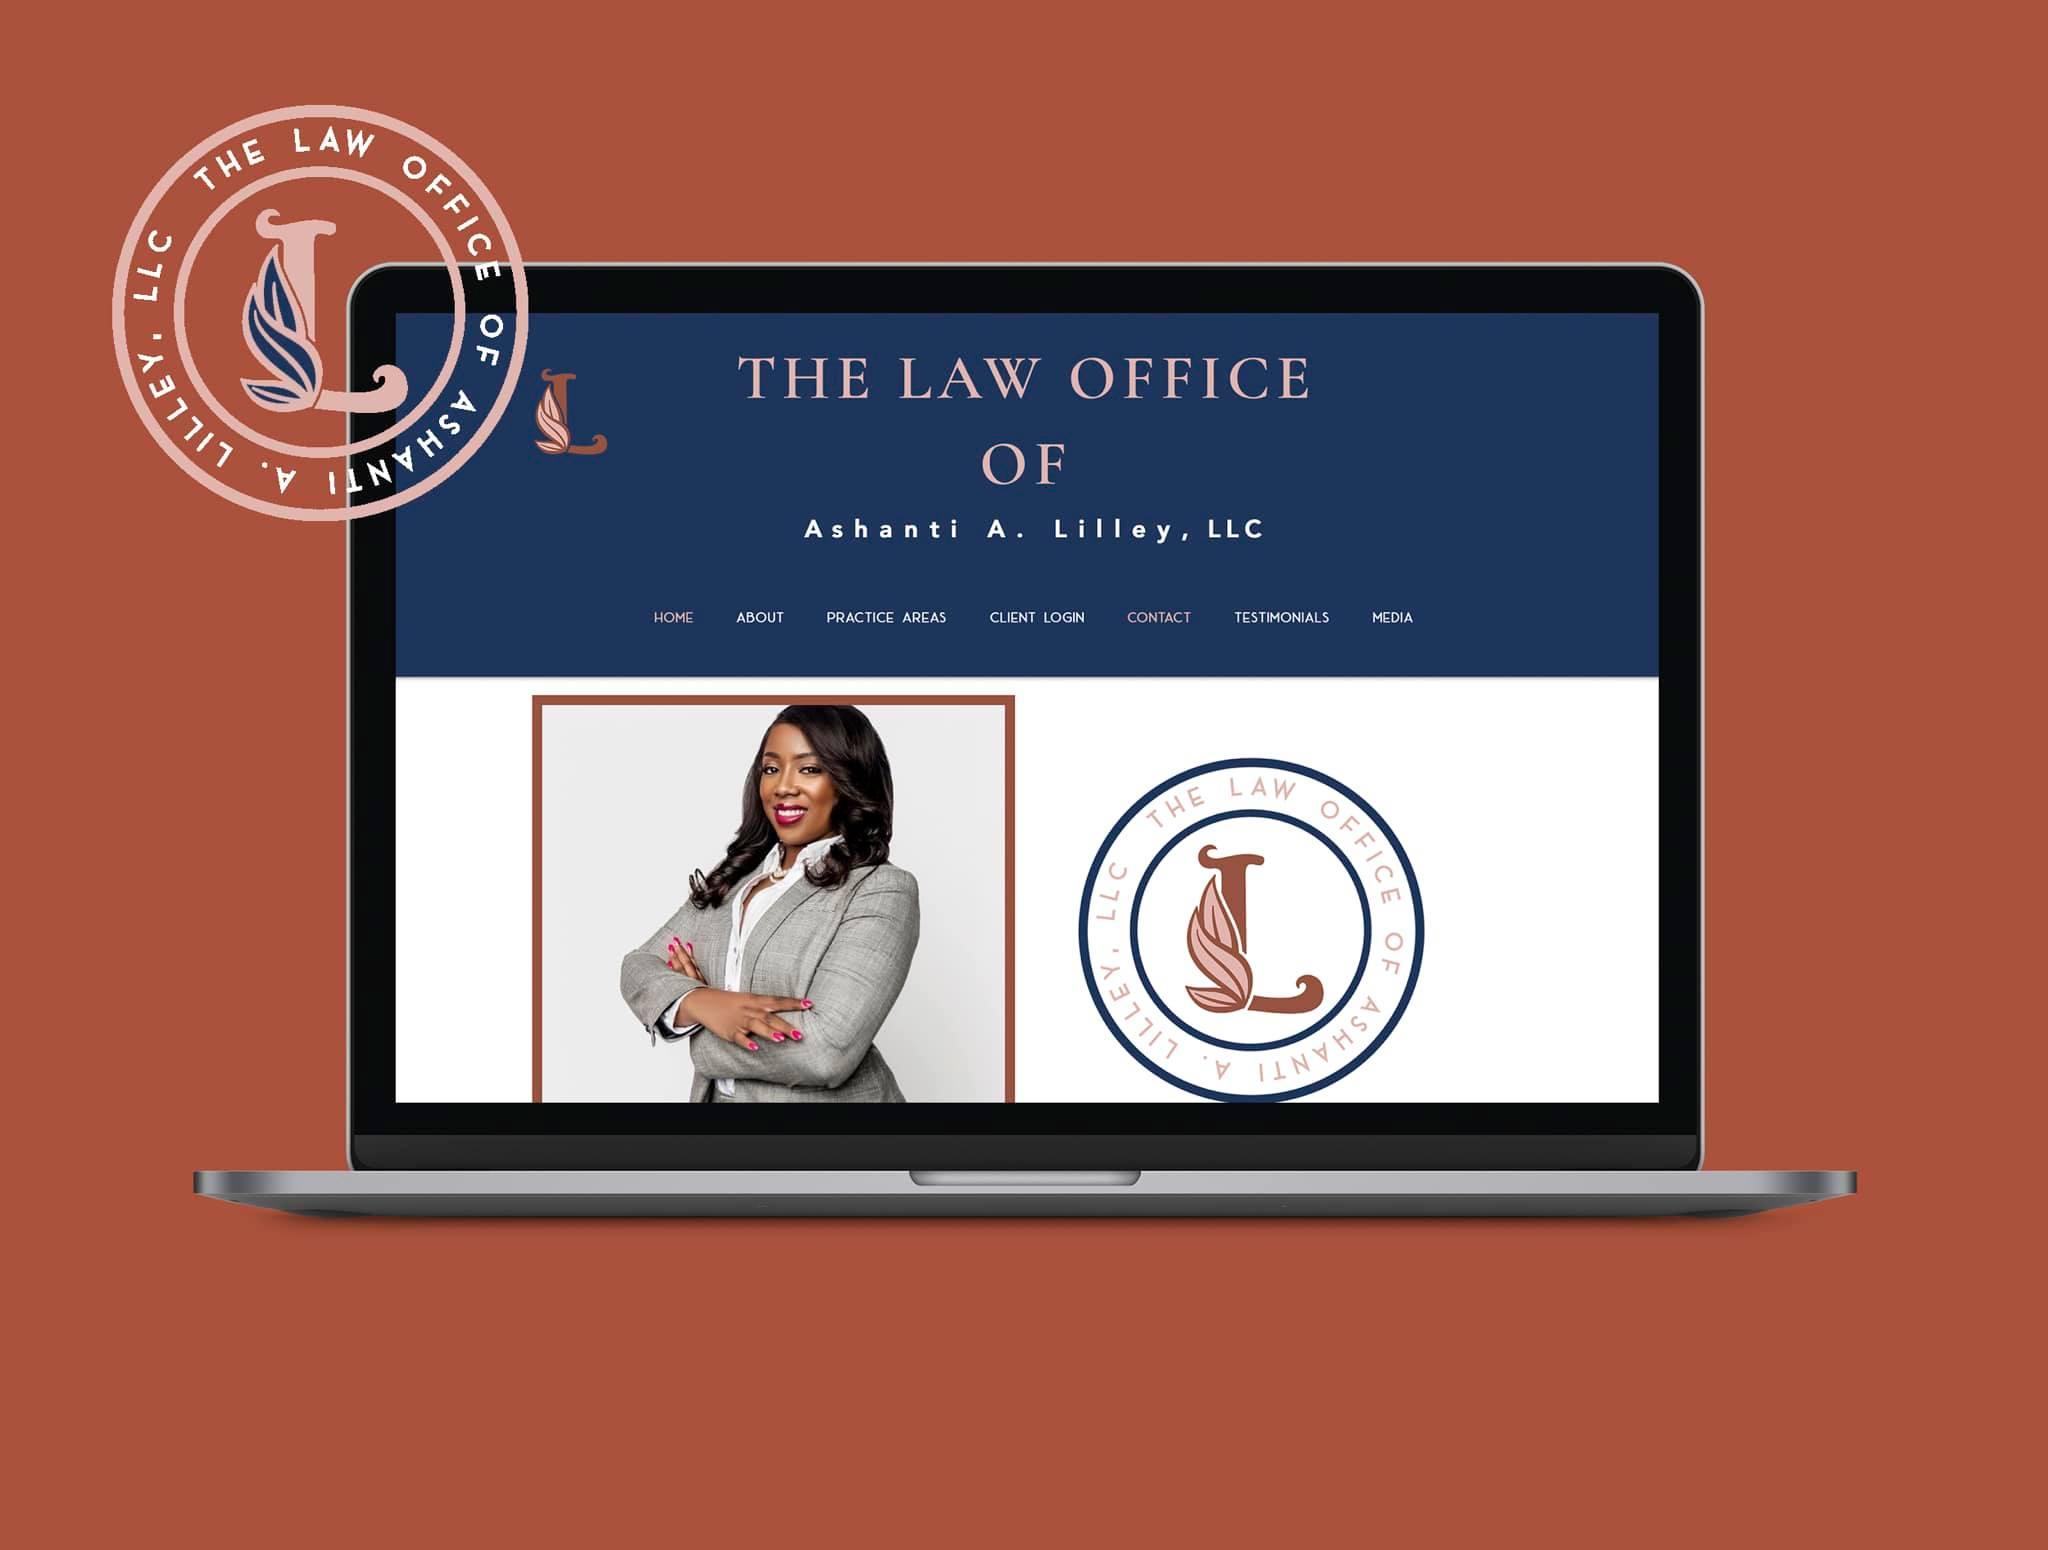 The Law Office of Ashanti A. Lilley, LLC